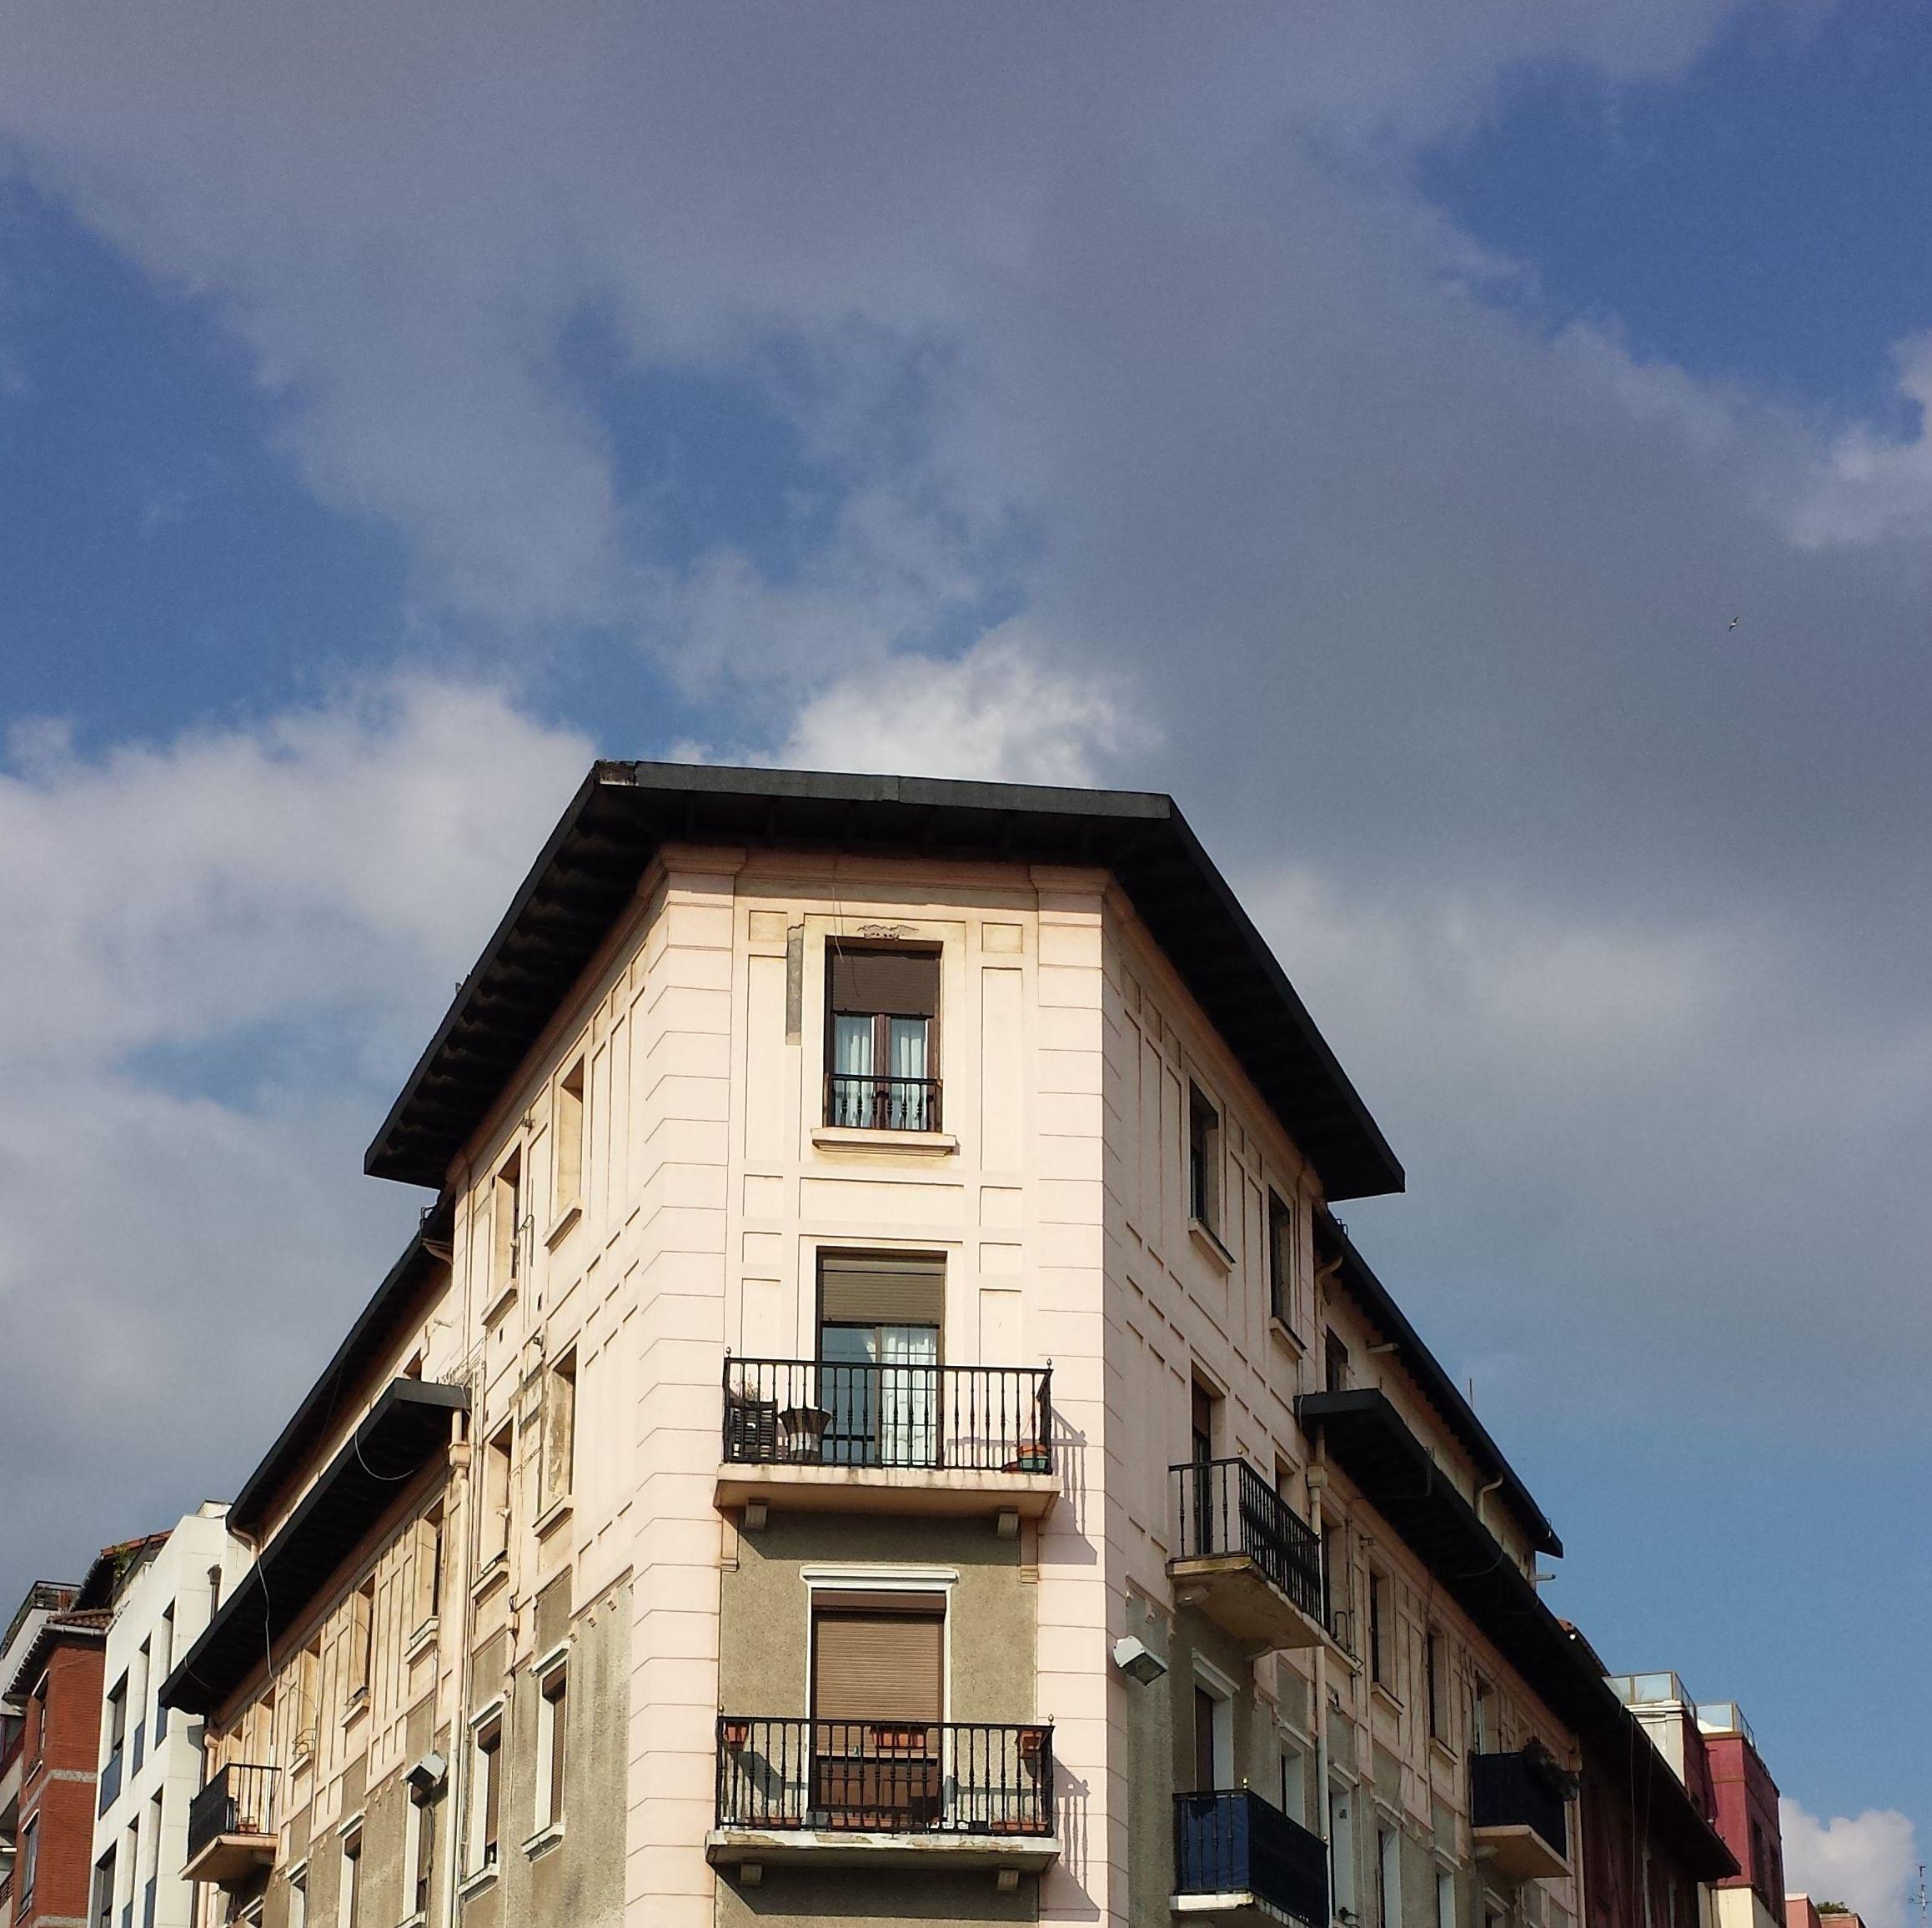 Ibaiondo 13 ROMO LAS ARENAS GETXO (fachada antes)